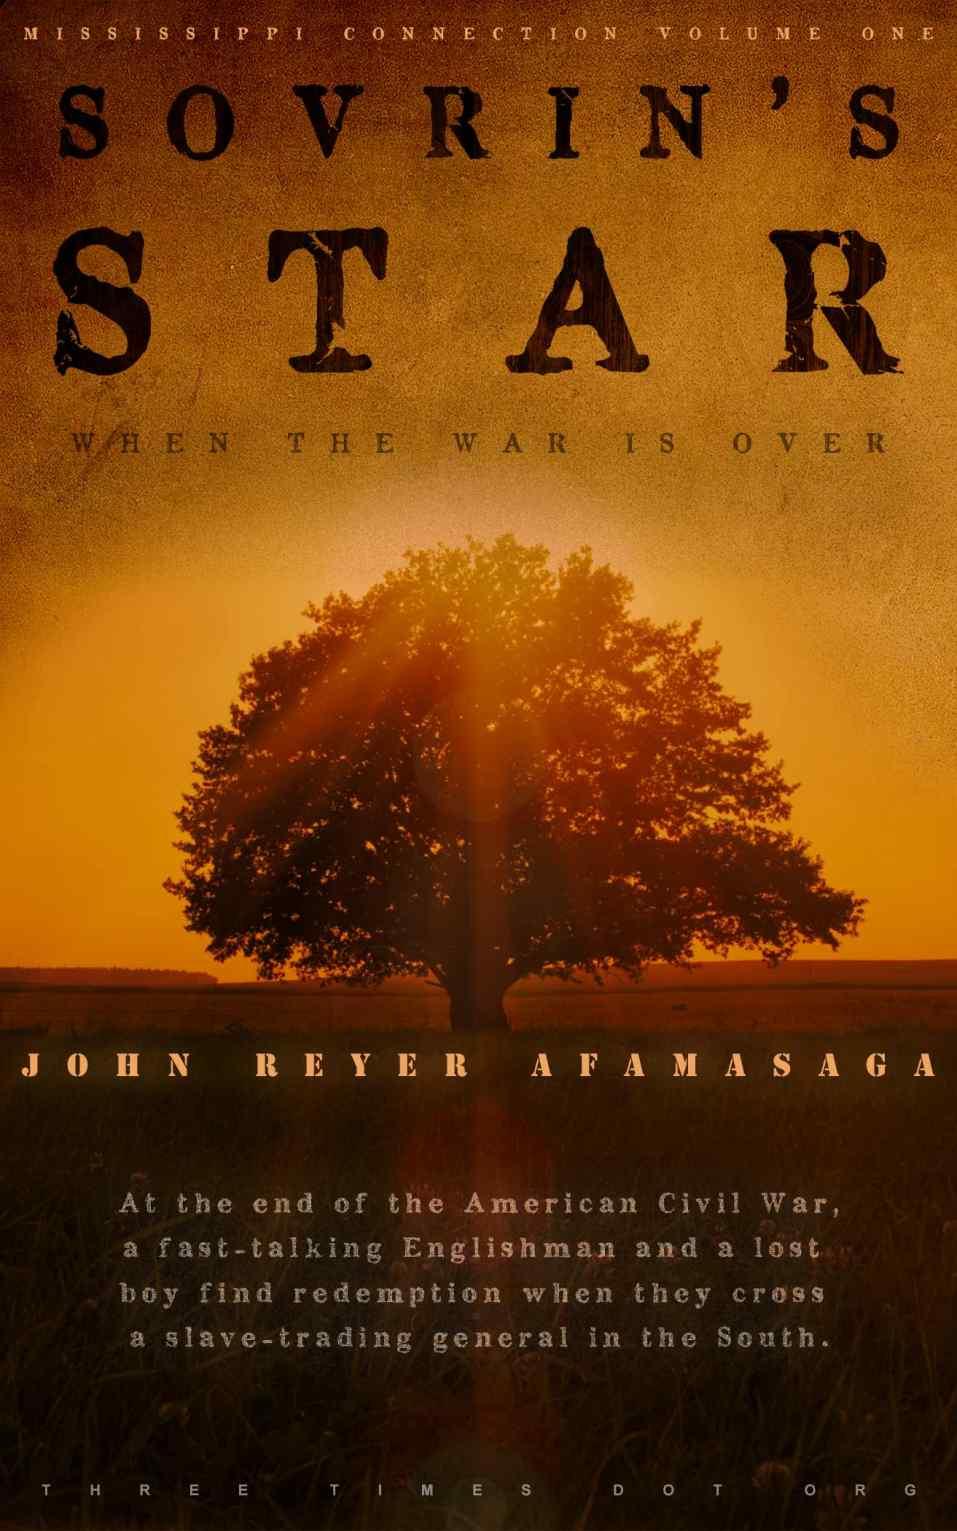 Sovrin's Star by John Reyer Afamasaga